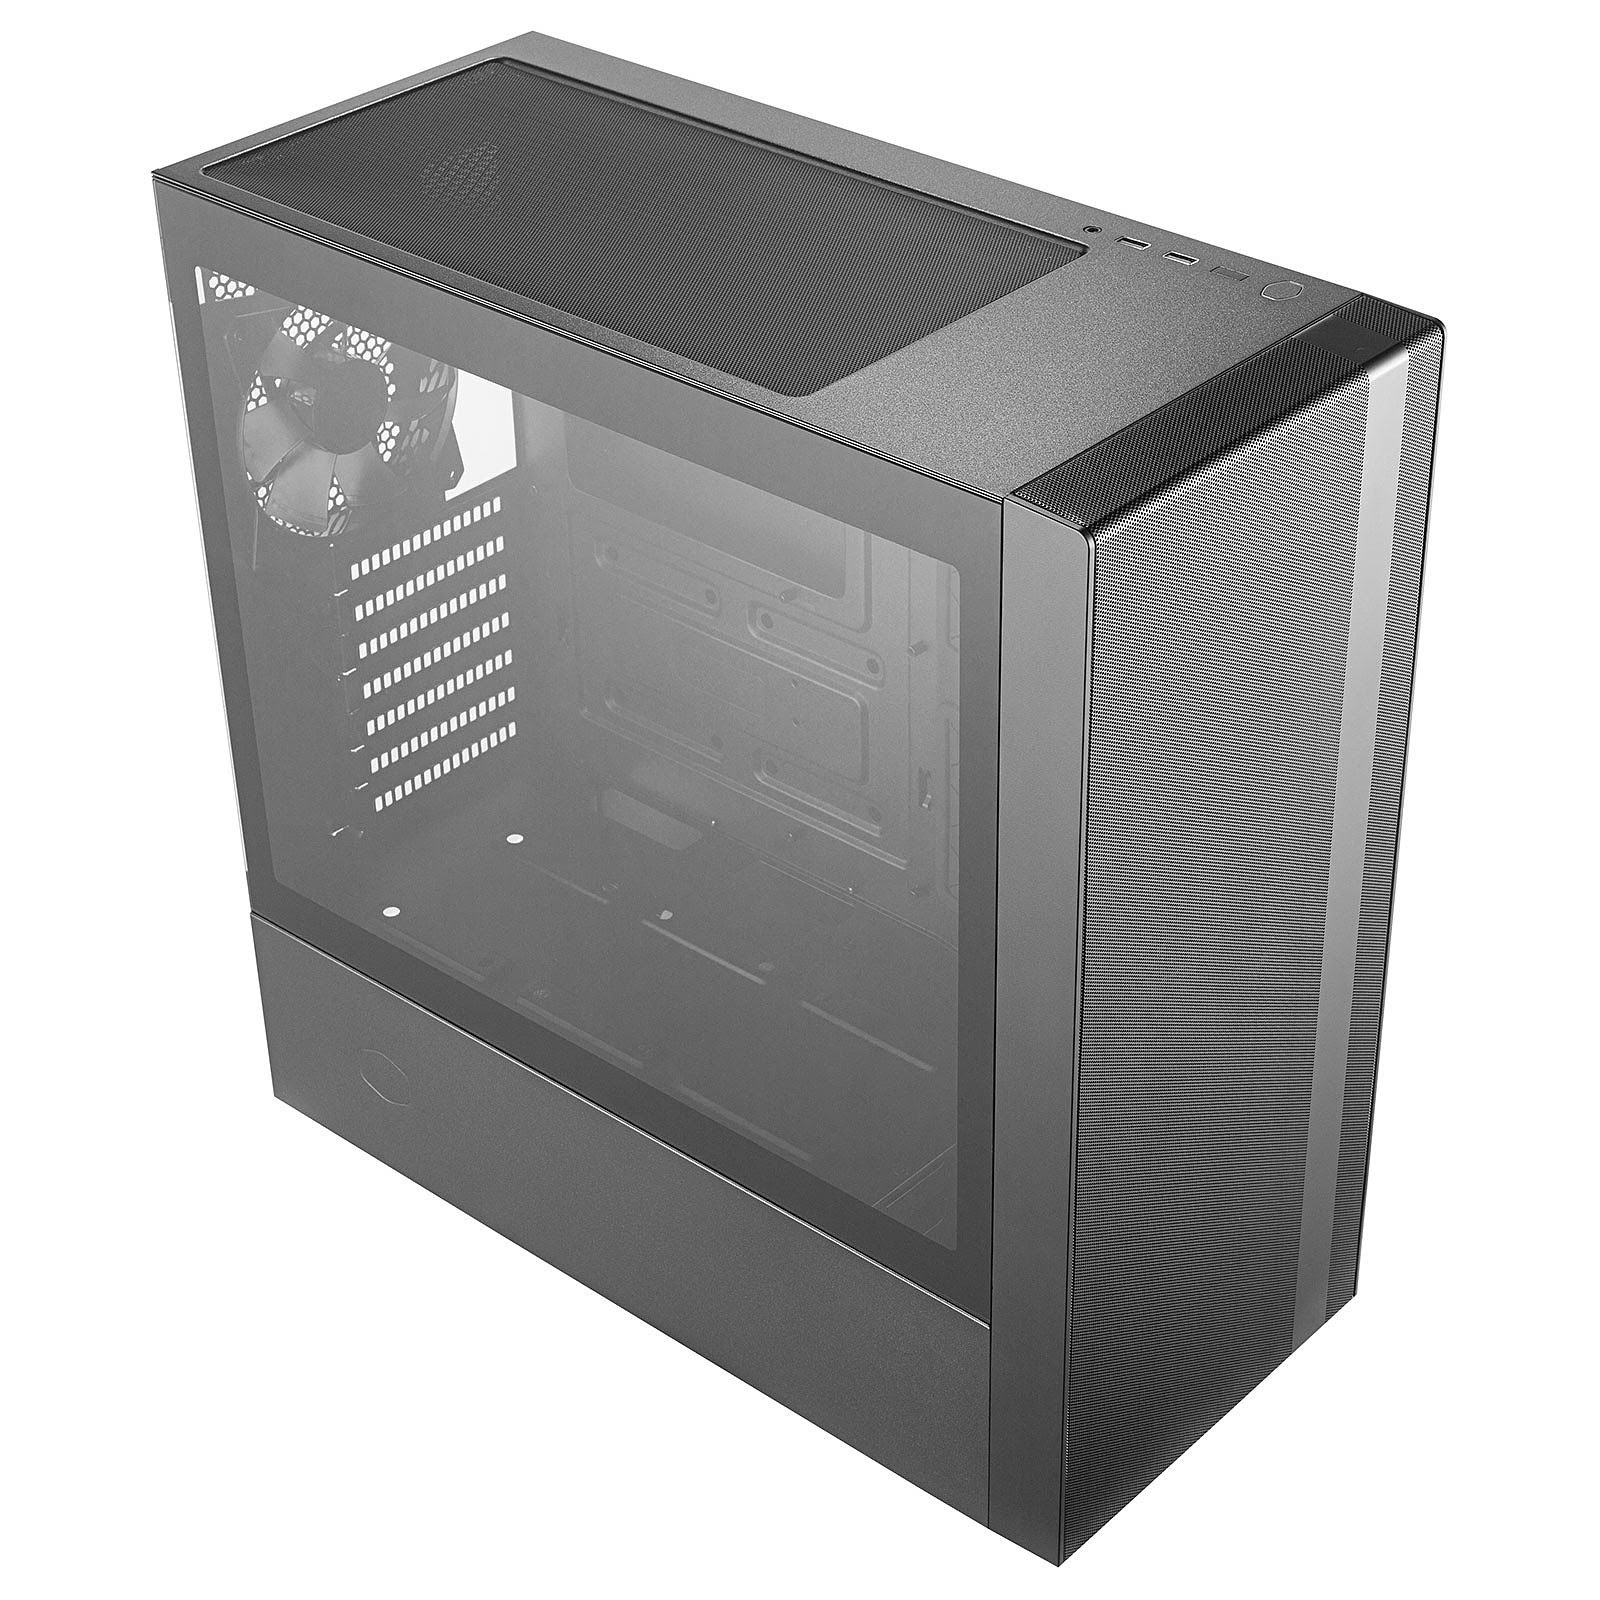 Cooler Master MasterBox NR600 MCB-NR600-KGNN-S00 Noir - Boîtier PC - 4